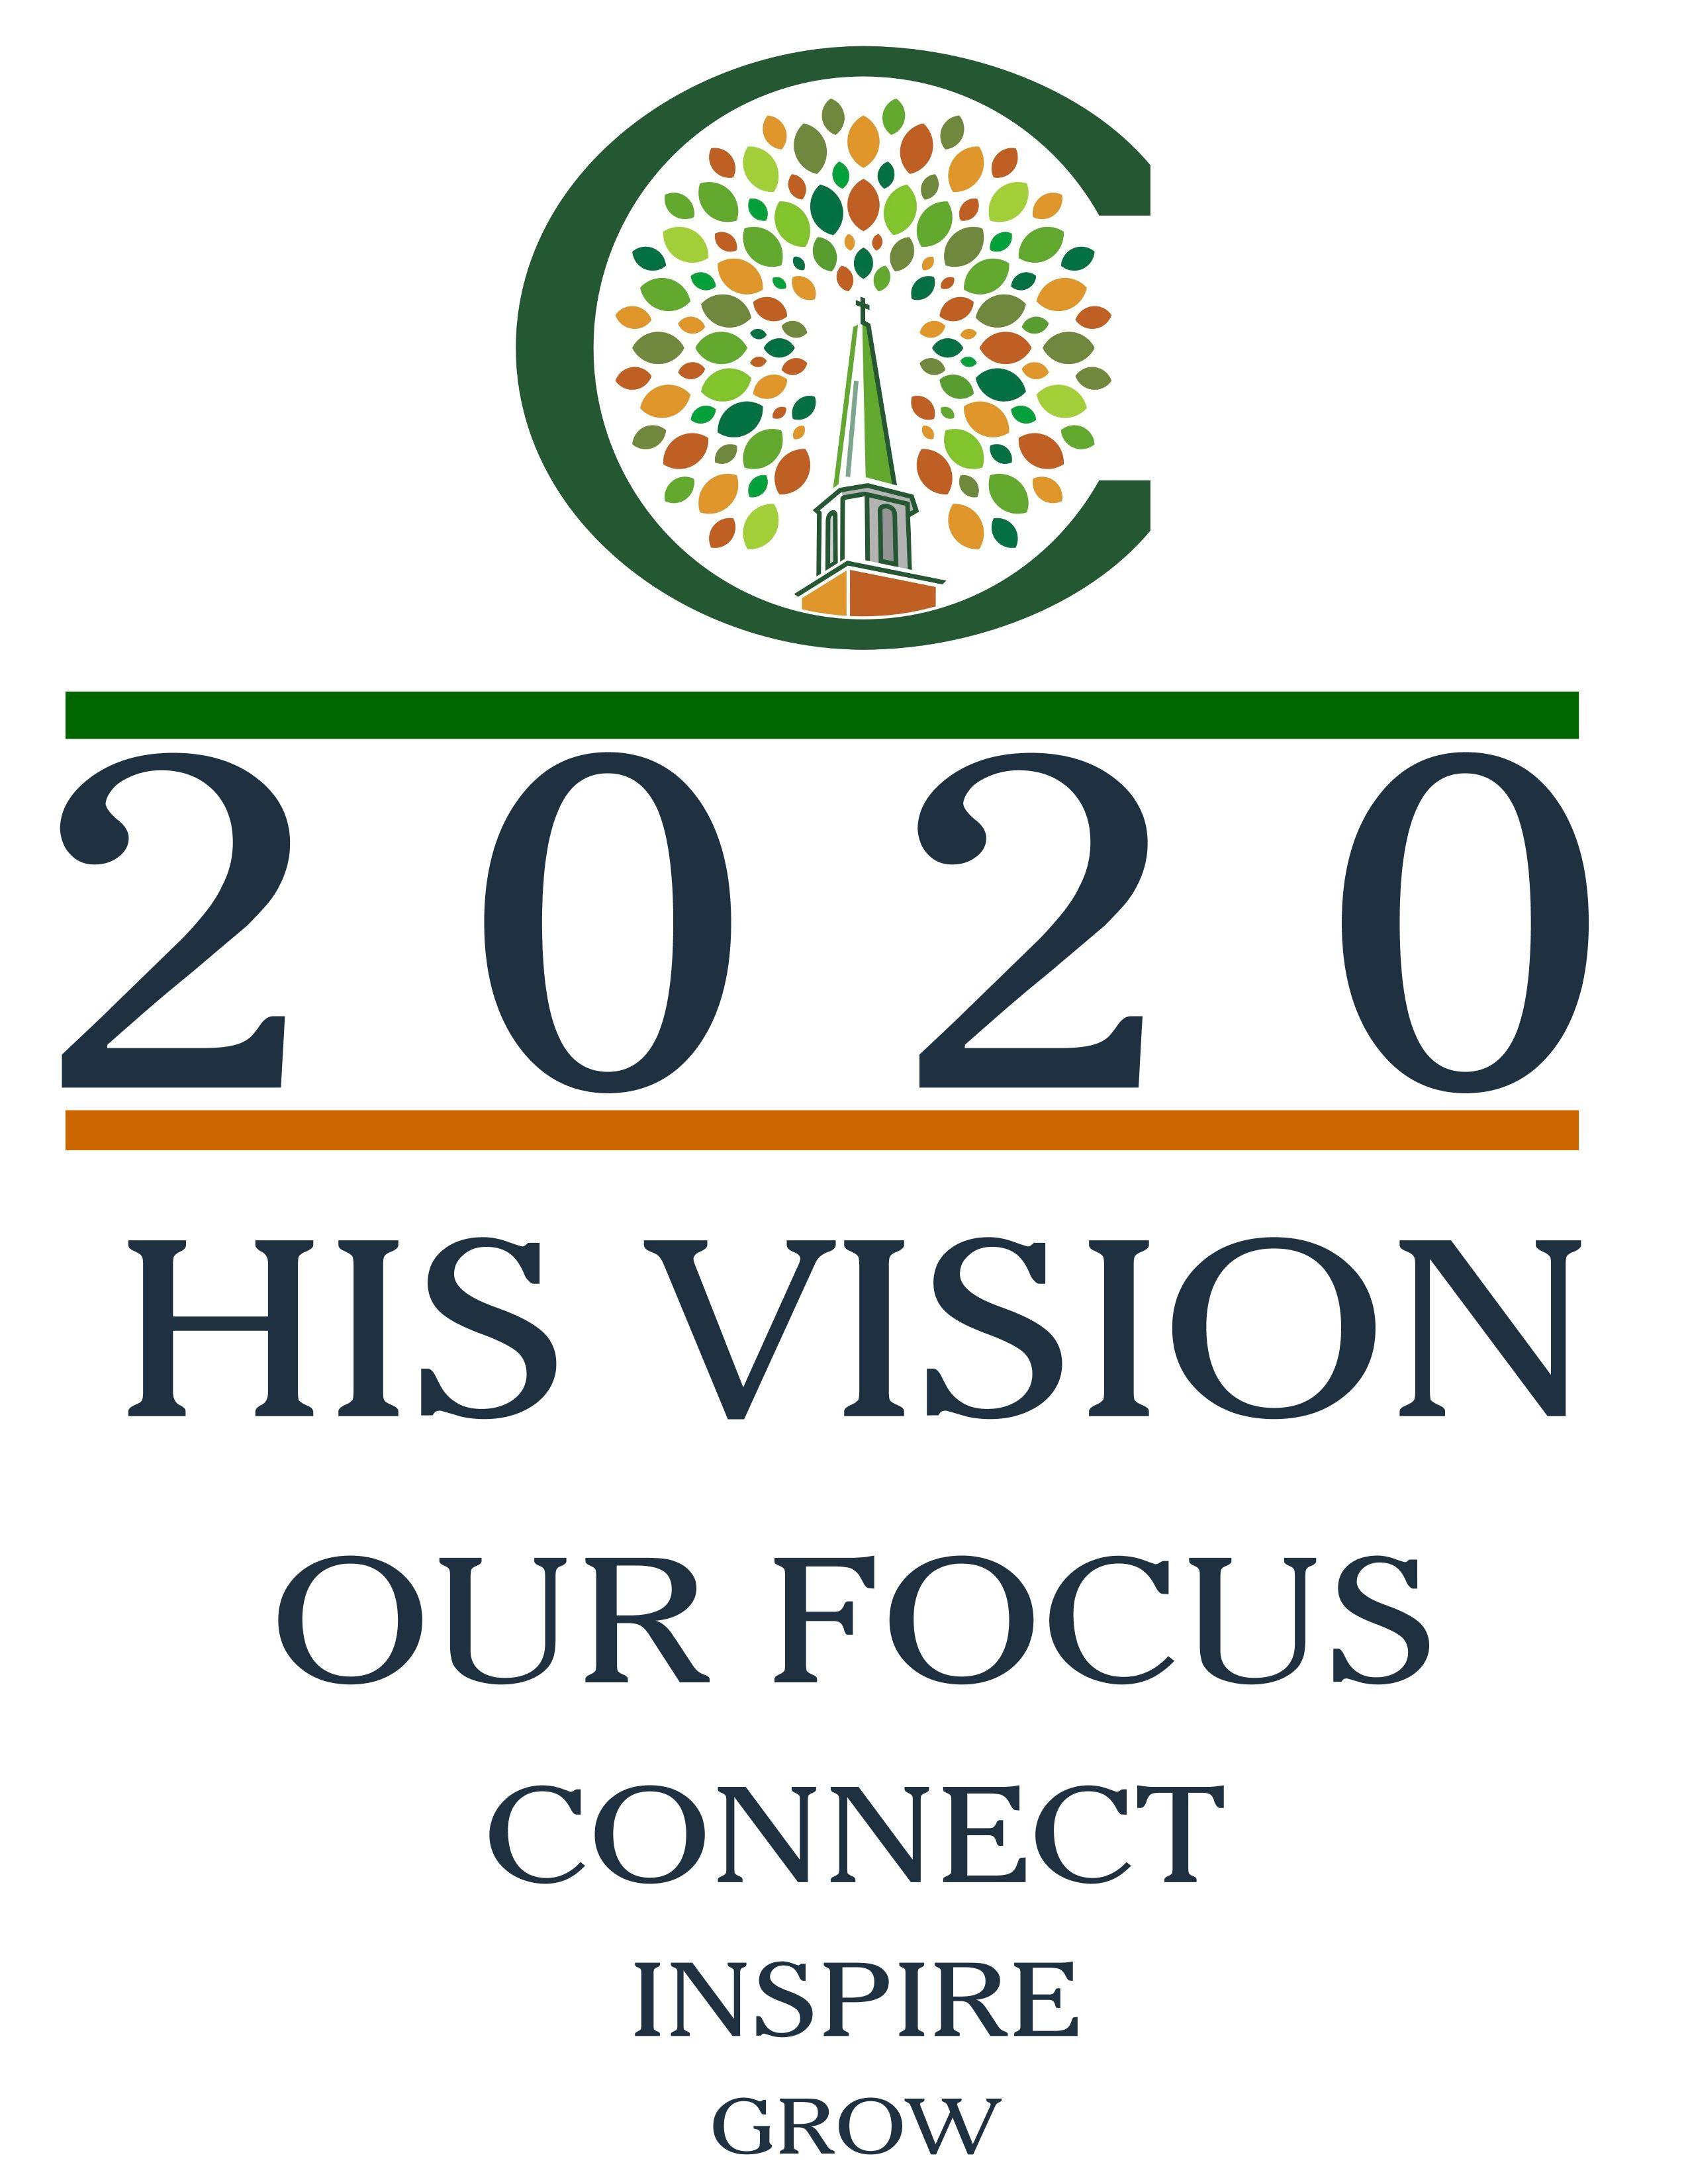 2020 VISSION-001